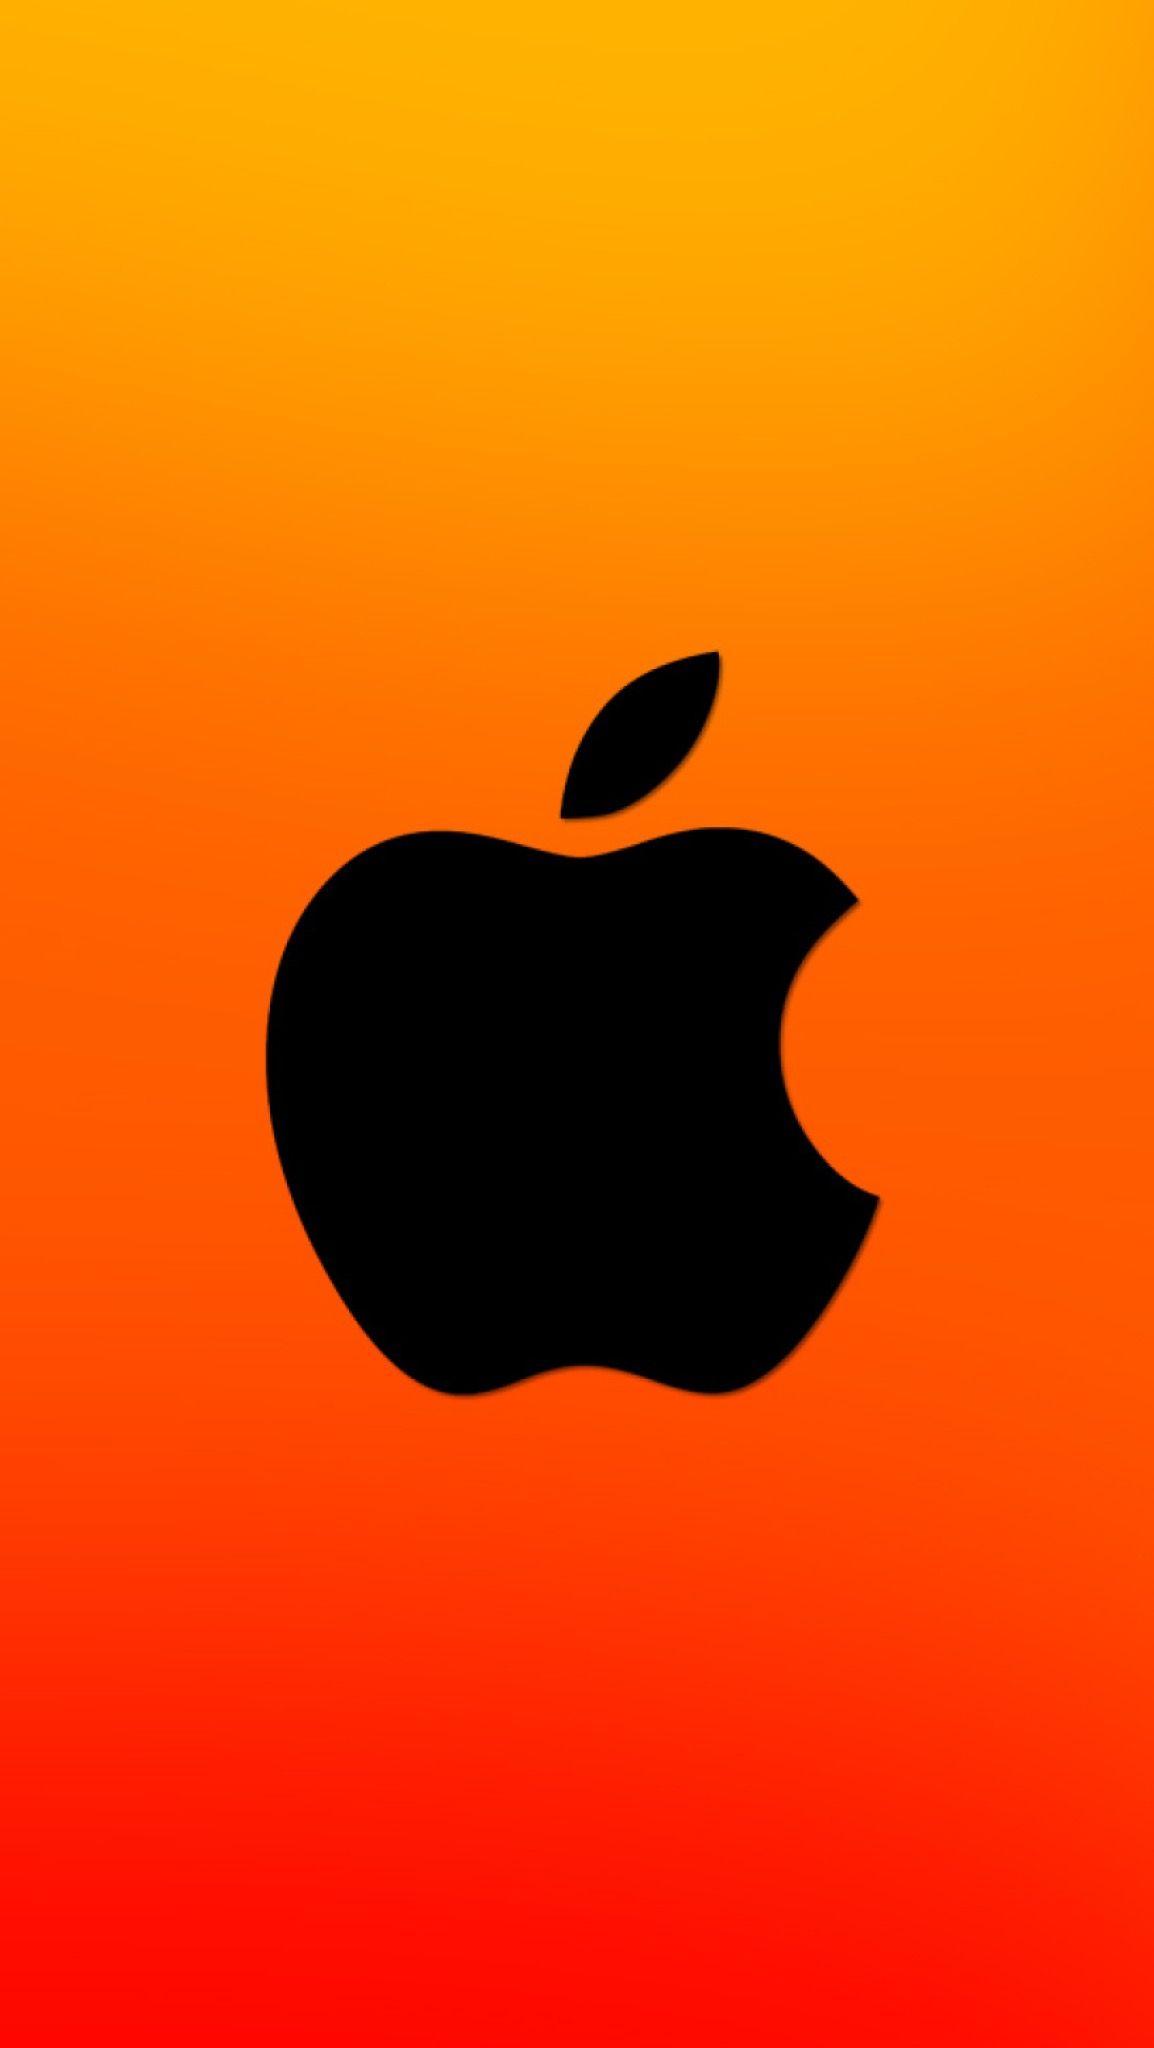 Connu iPhone 7 Wallpaper - Black 3D Apple | iphone wallpapers  AF33